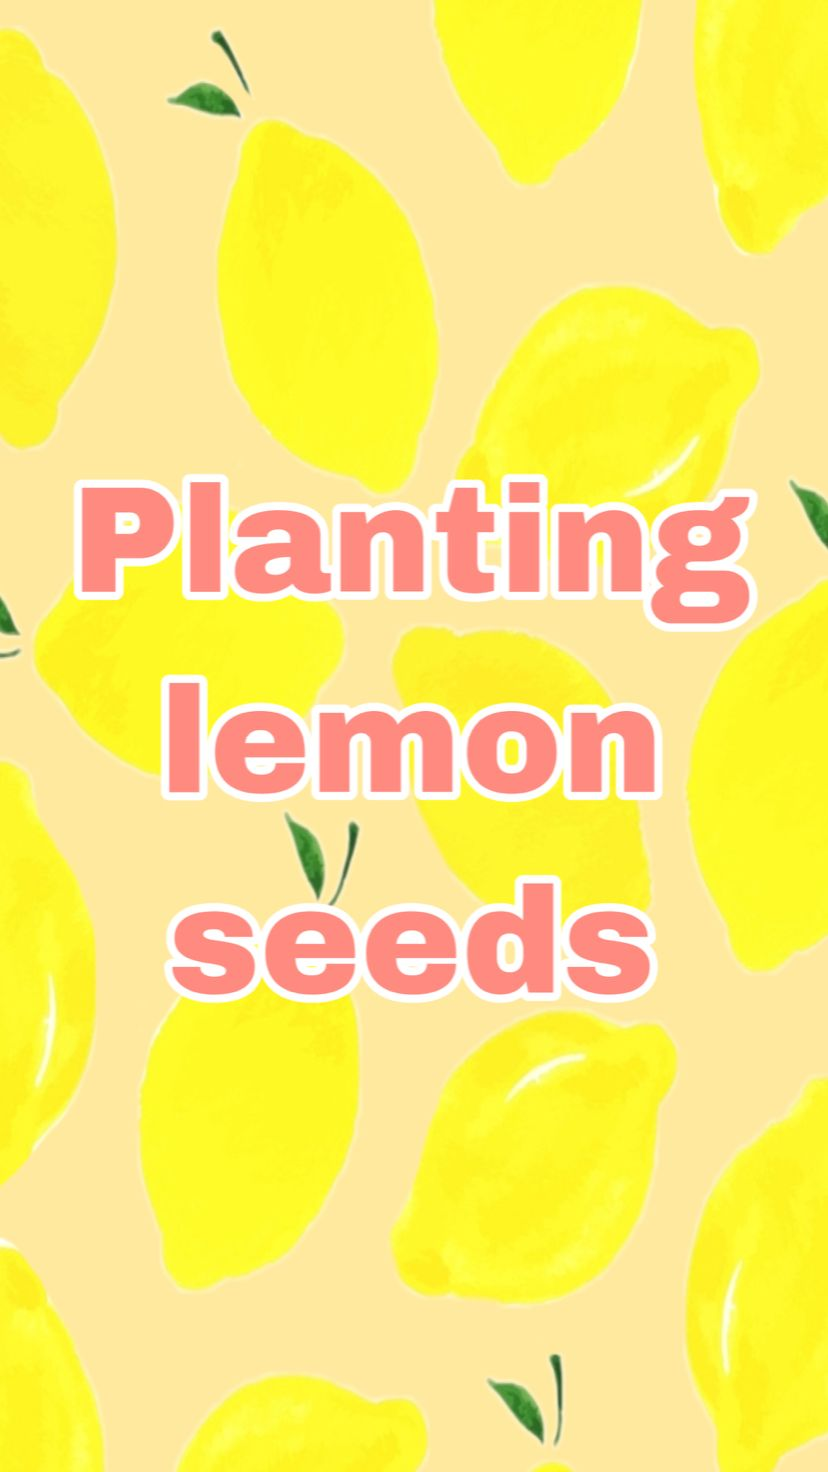 Planting Lemon Seeds!